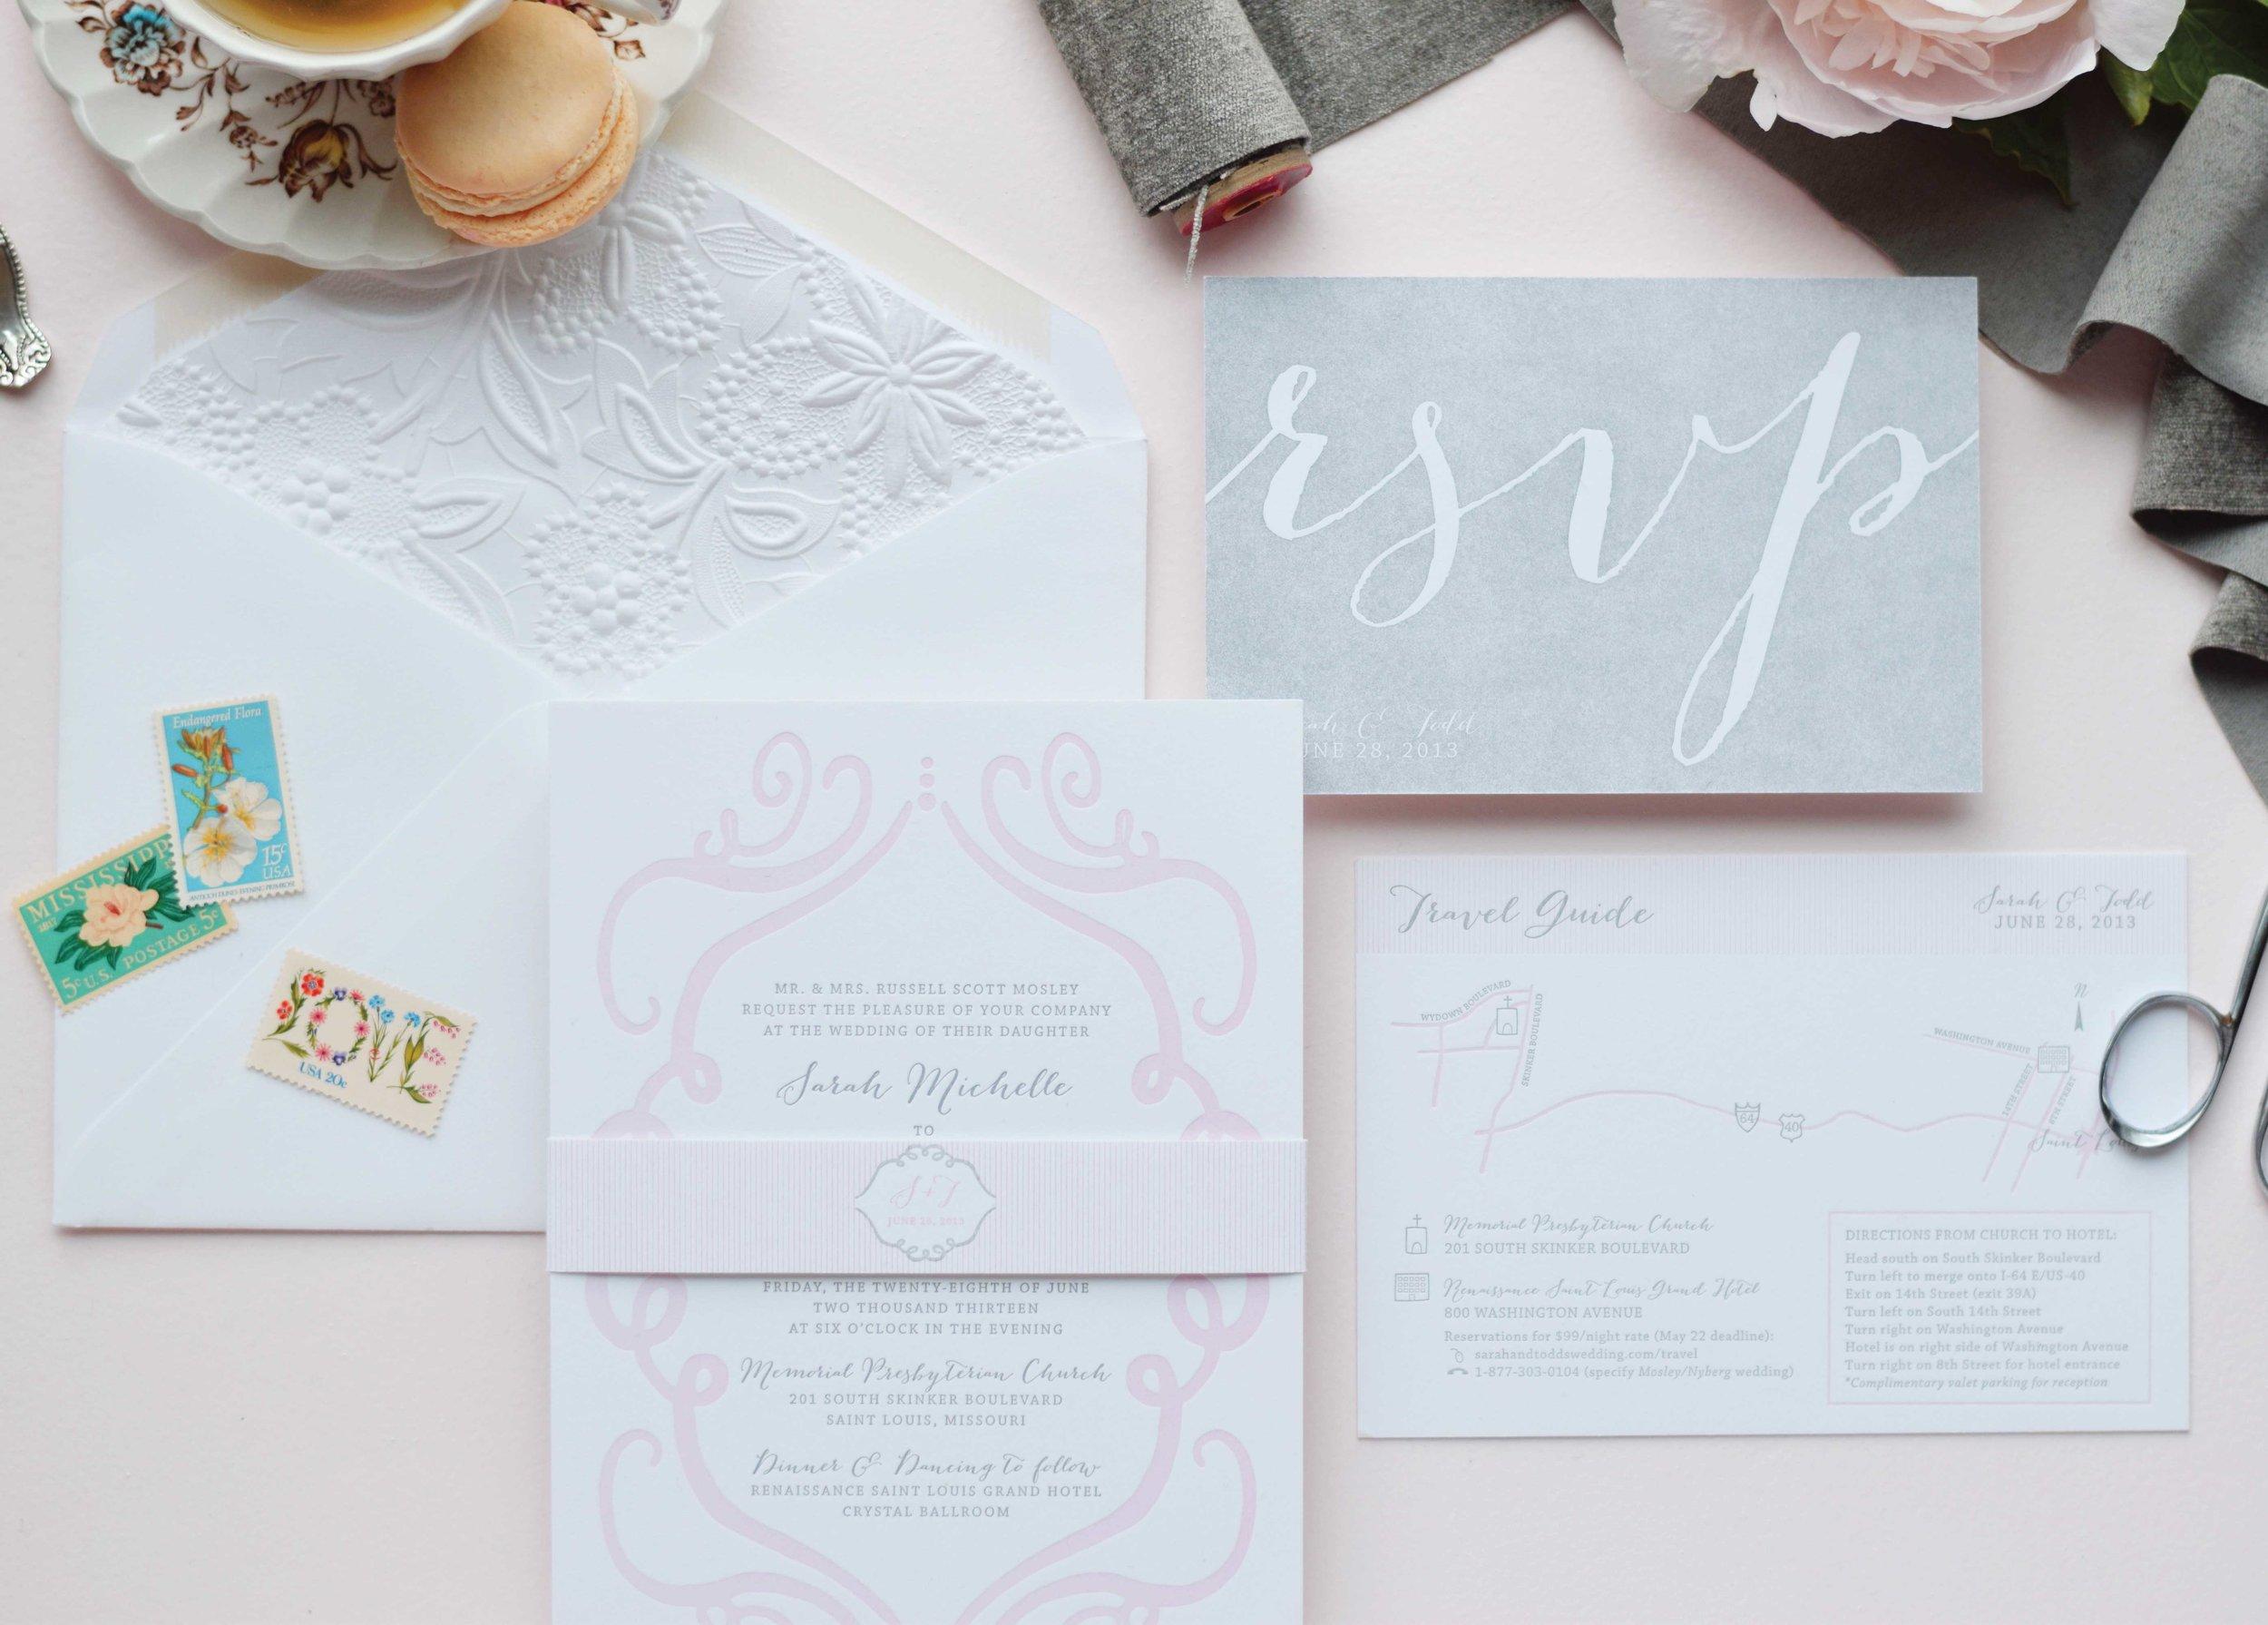 blush_pink_gray_letterpress_wedding_invitation.jpg